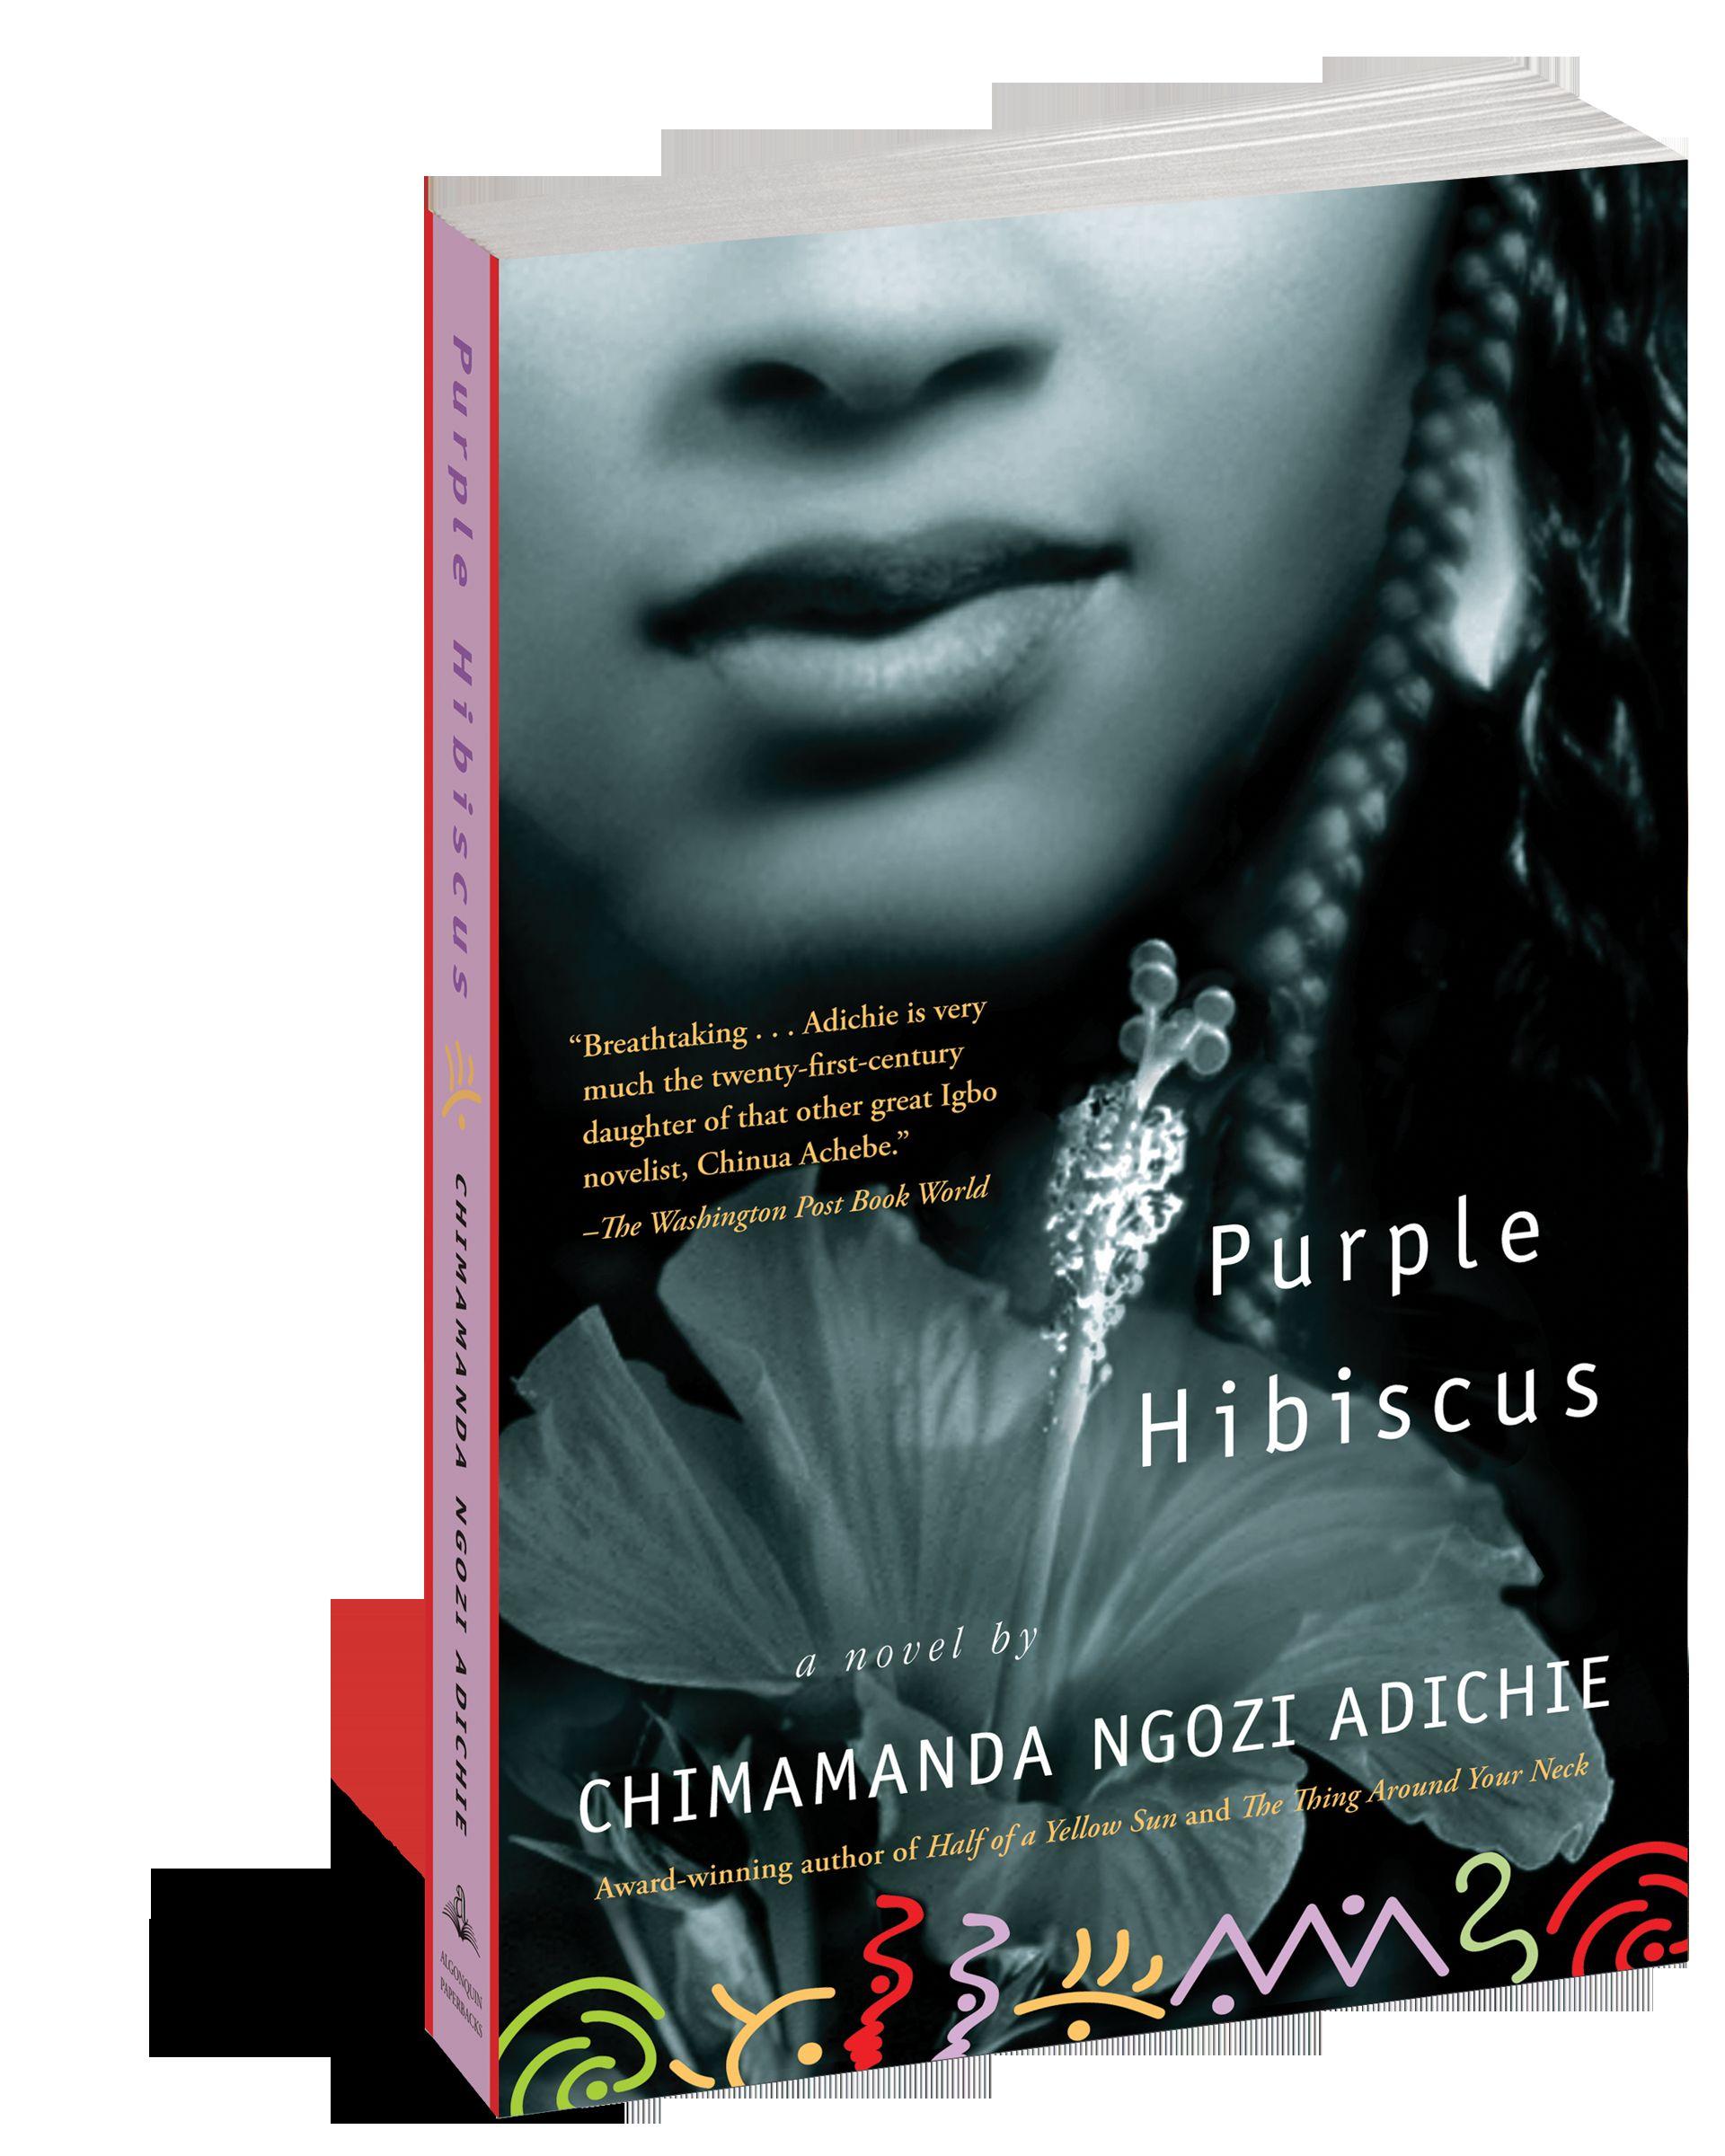 9781616202415 Purple Hibiscus A Novel By Chimamanda Ngozi Adichie